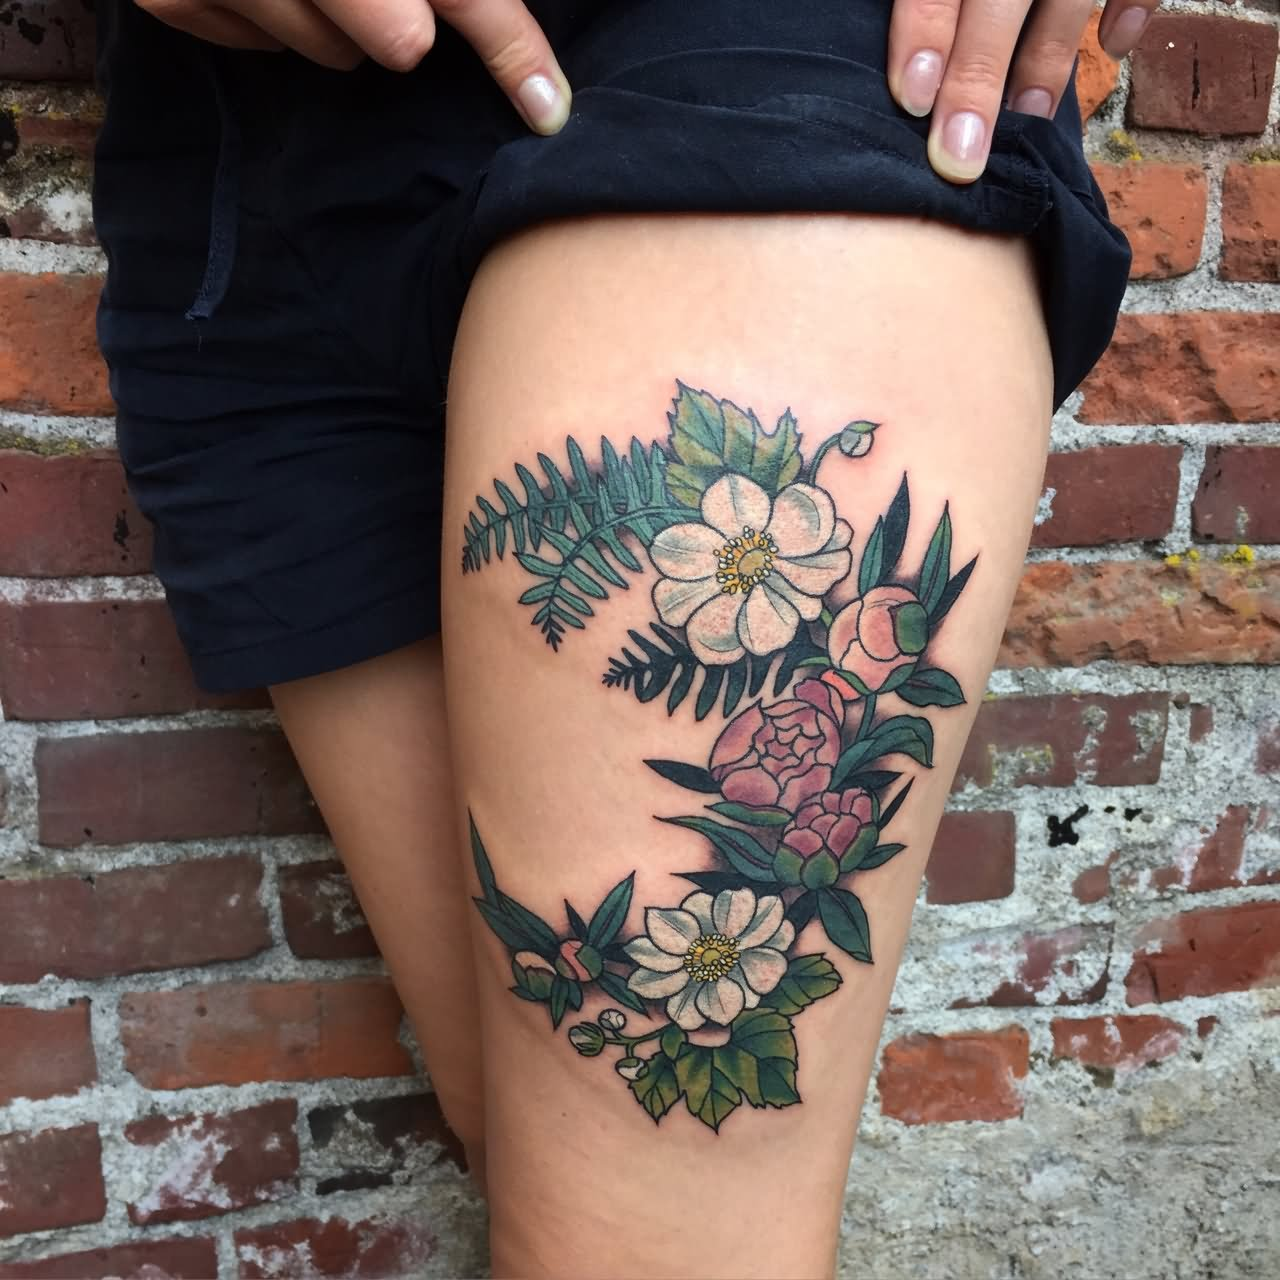 46 Awesome Leg Tattoos